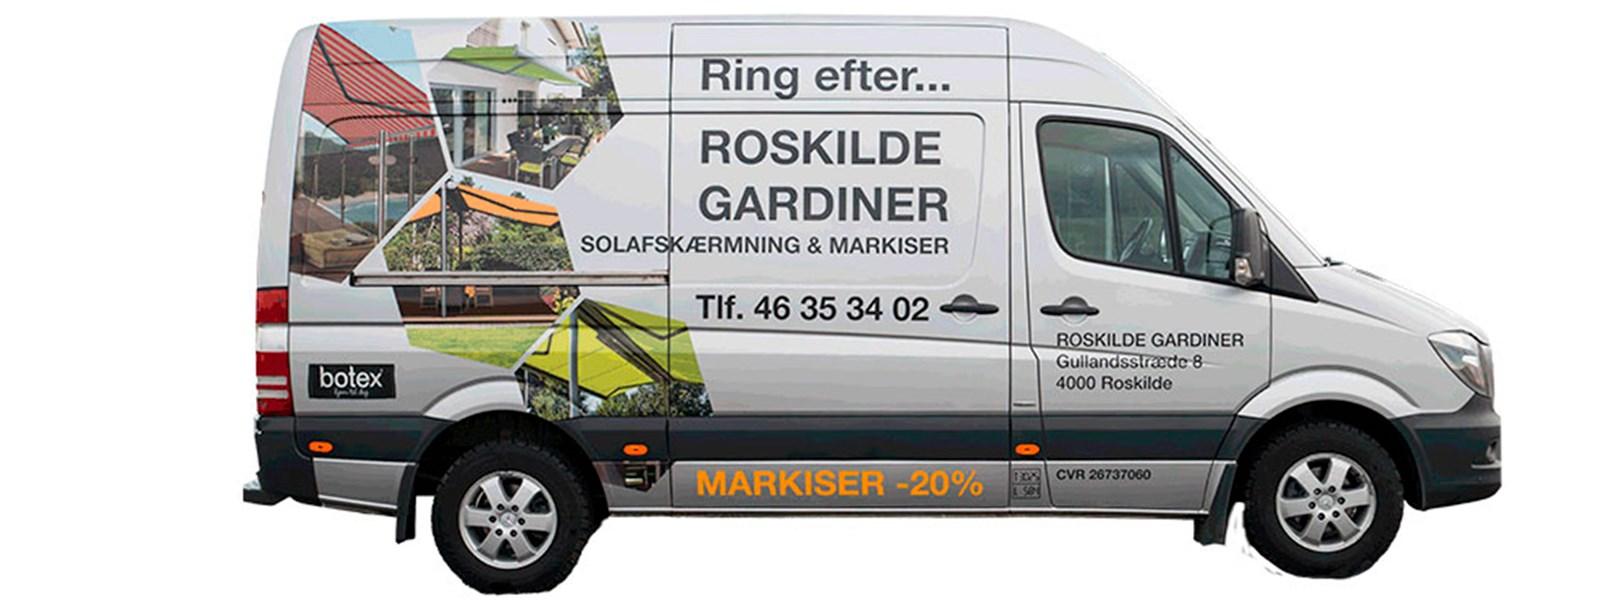 gardiner roskilde Find Roskilde Gardiner   Gullandsstræde 6 Roskilde 46 35 34 02 gardiner roskilde